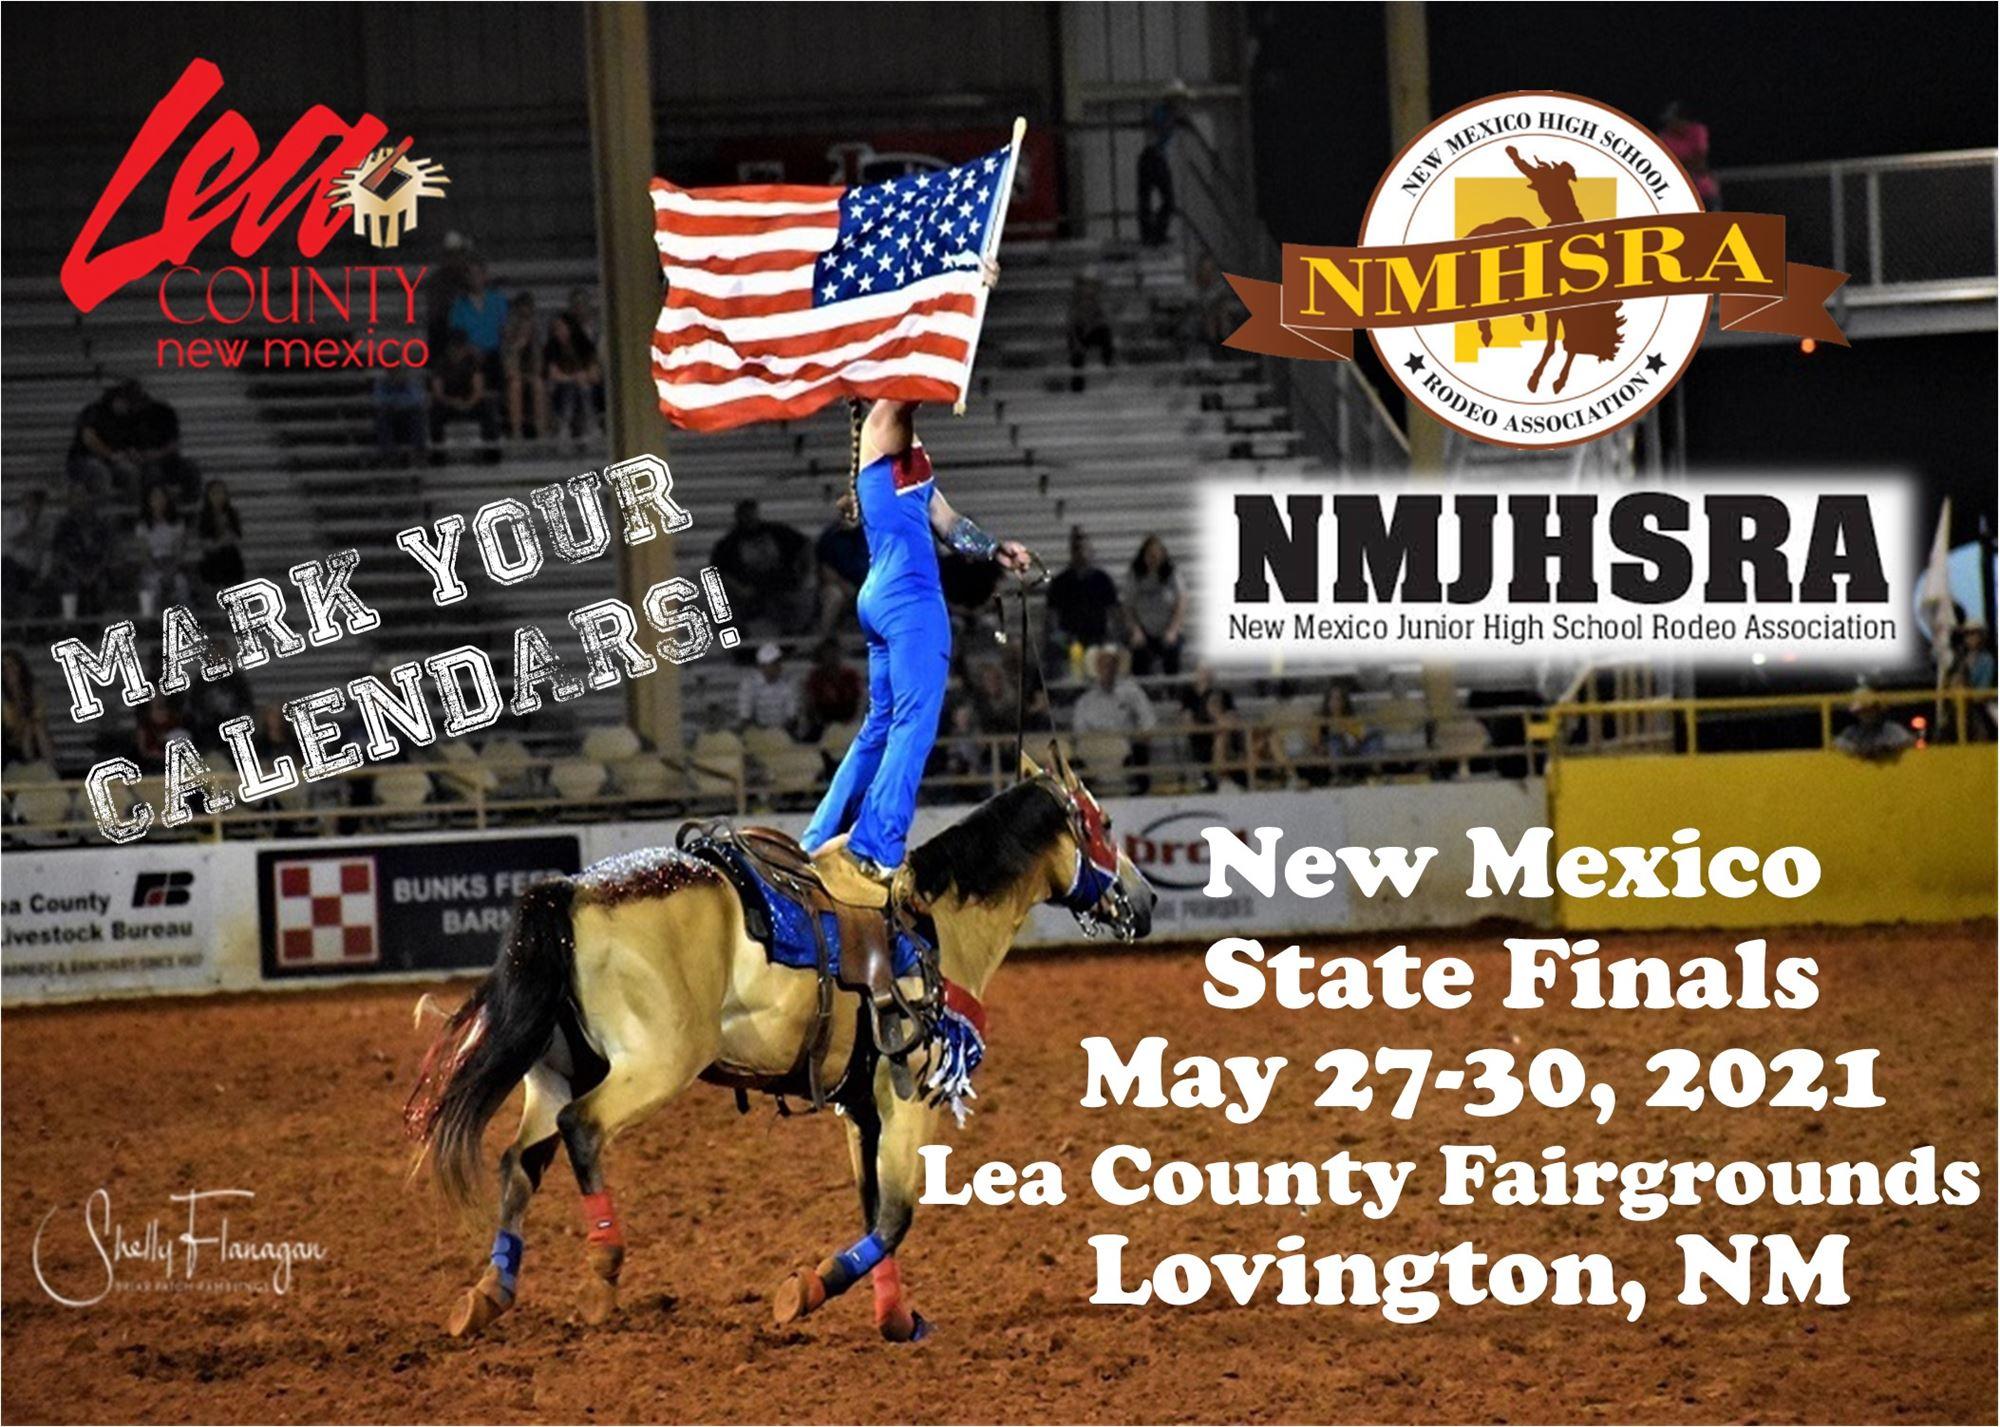 NMHSRA Finals